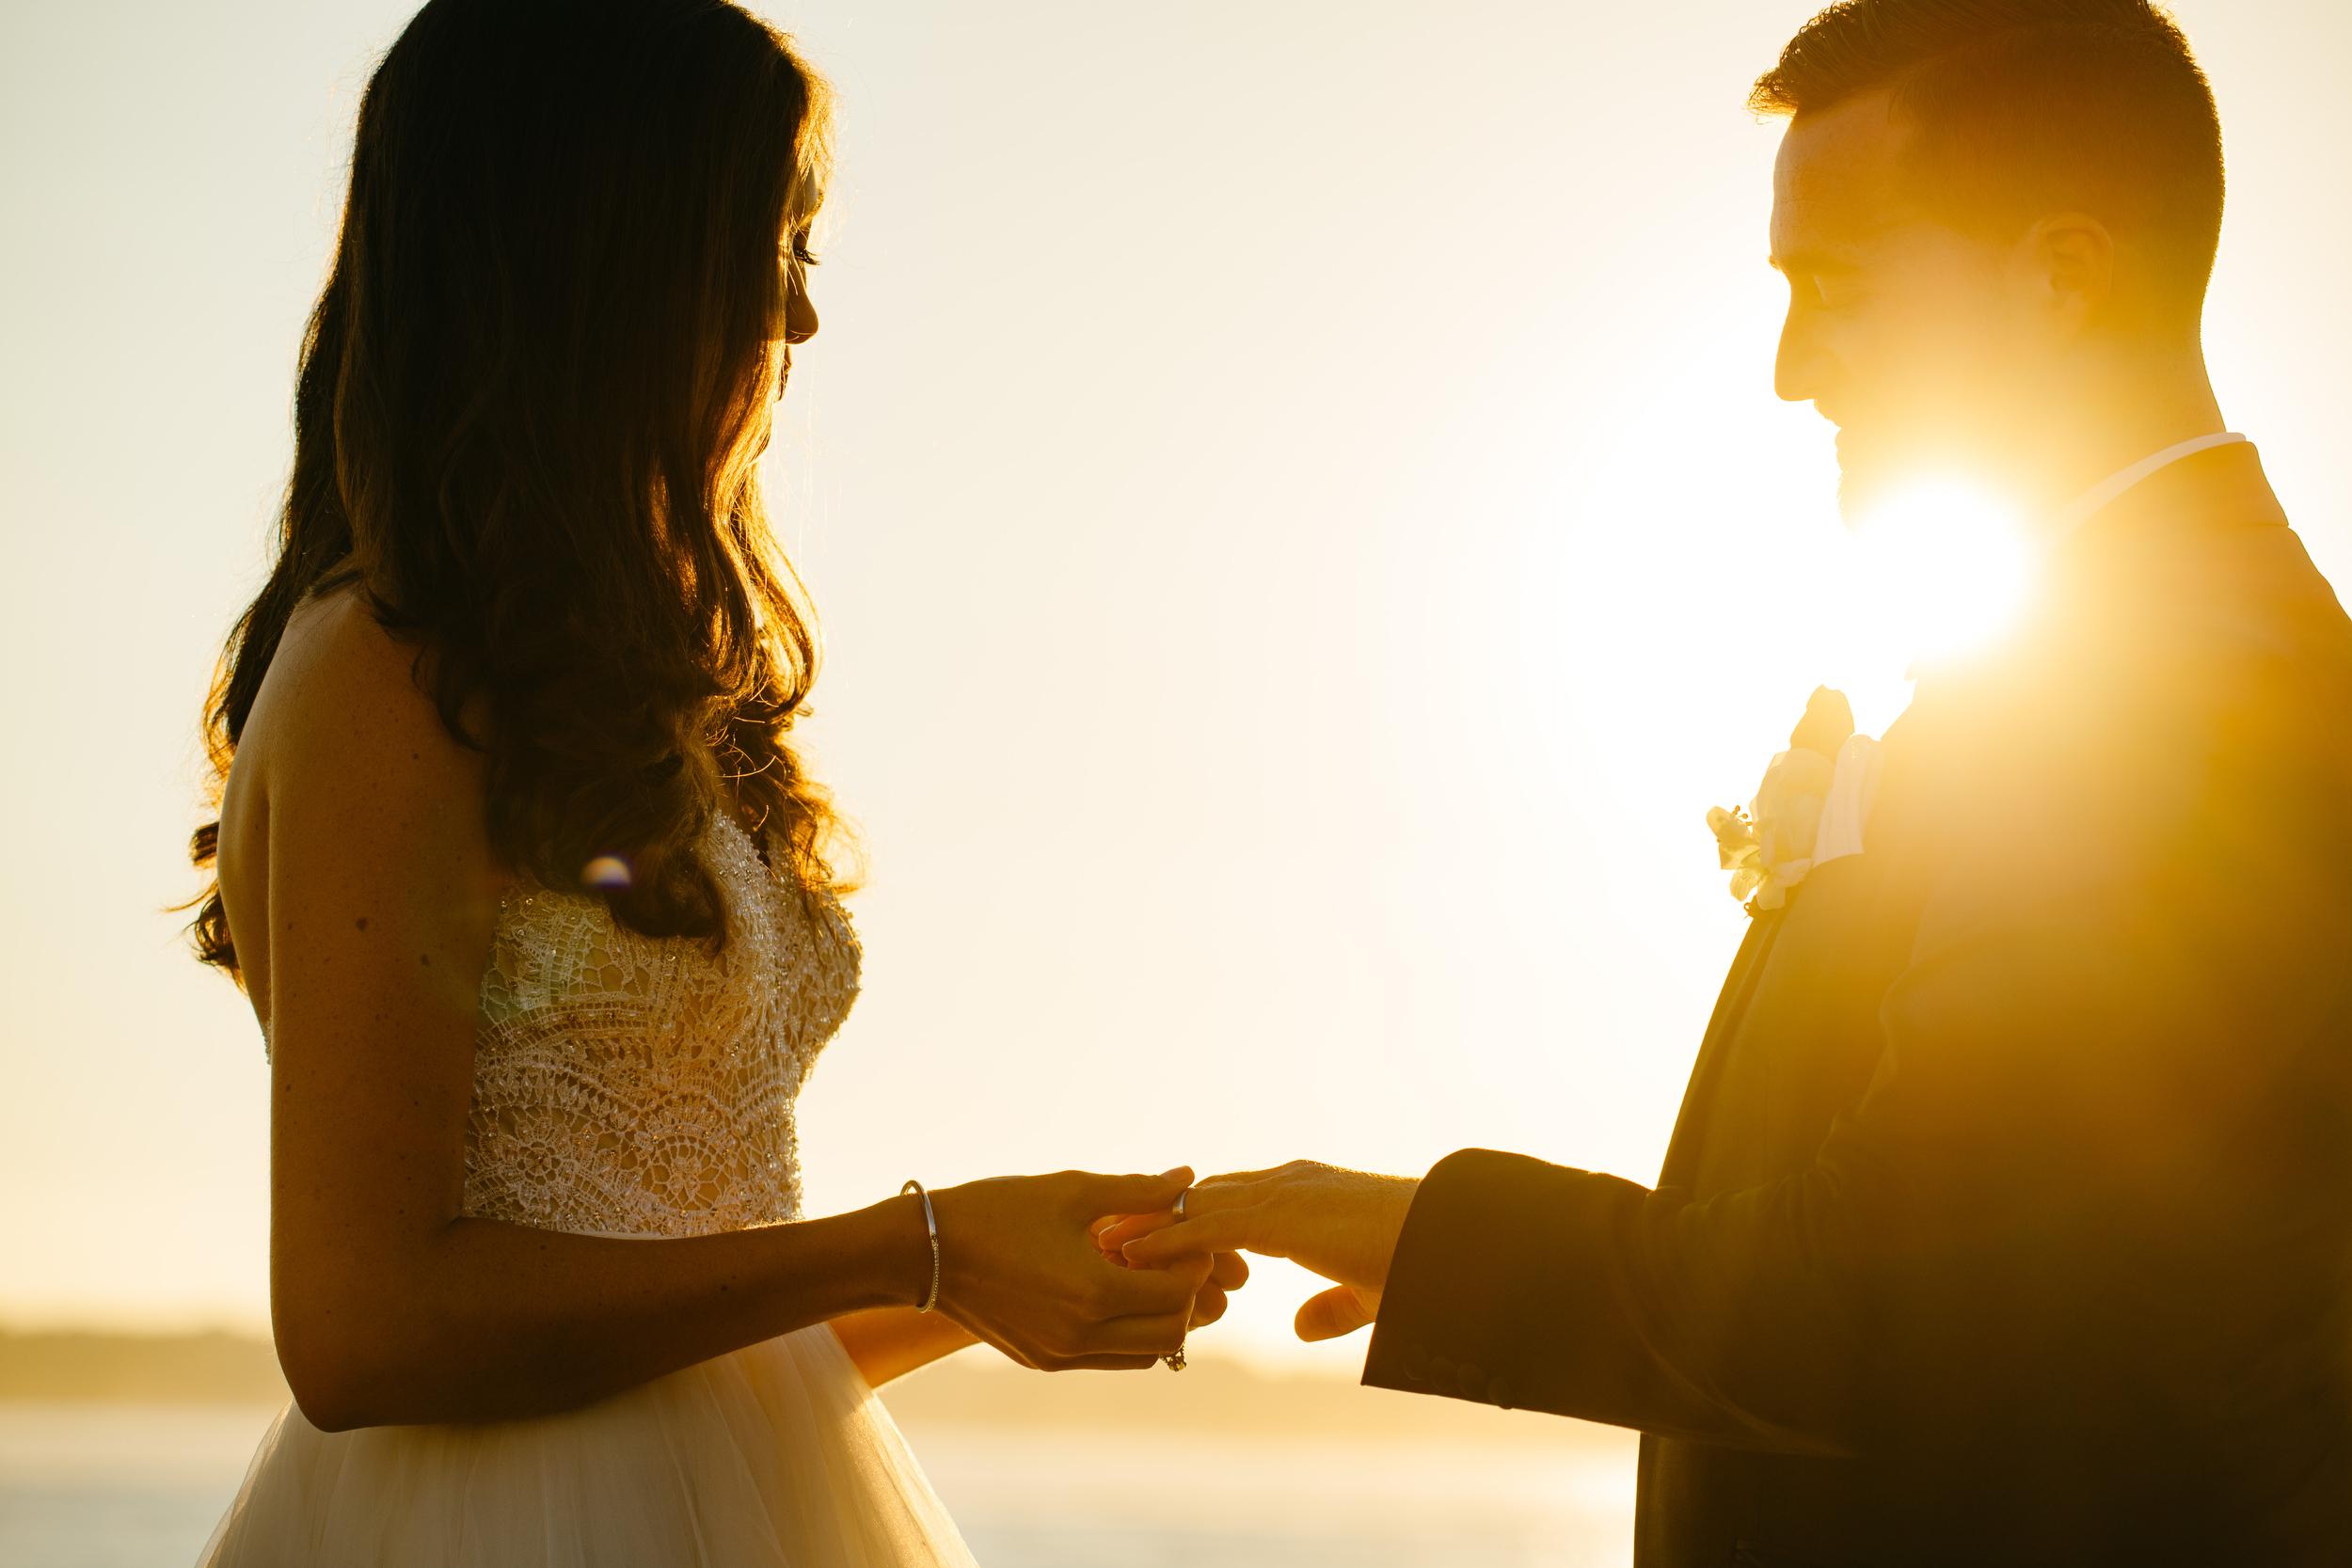 vogue brides ring exchange during sunset island destination wedding wedding ceremony at sunset